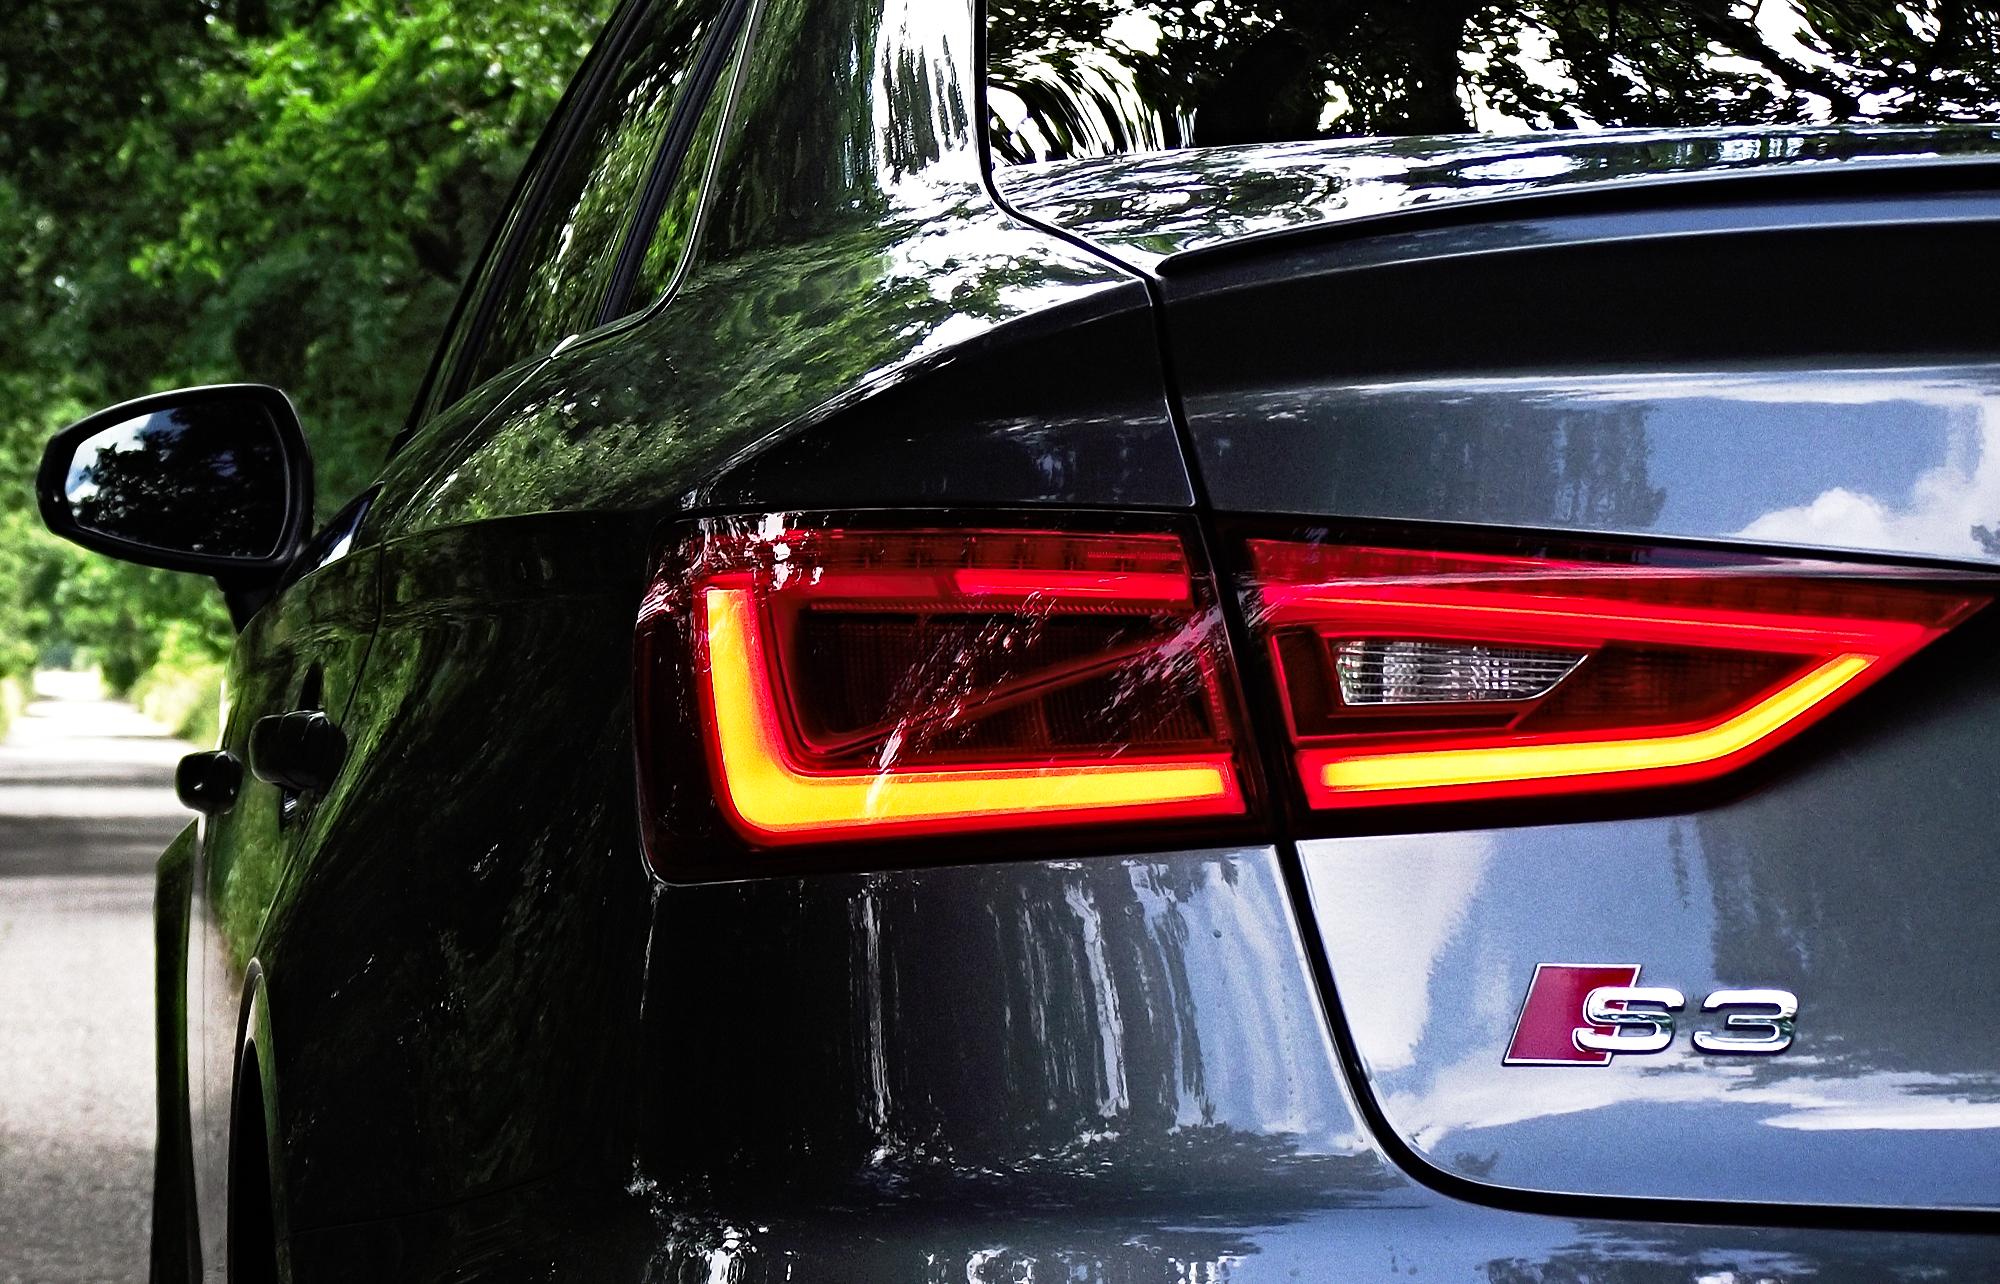 2013 Audi A3 S3 Limousine 8vs 2 0 Tfsi S Tronic Quattro Daytonagrau Perleffekt Led Heckleuchte 01 Mario Von Berg Kickaffe Nachtigall Ick Hor Dir Trapsen